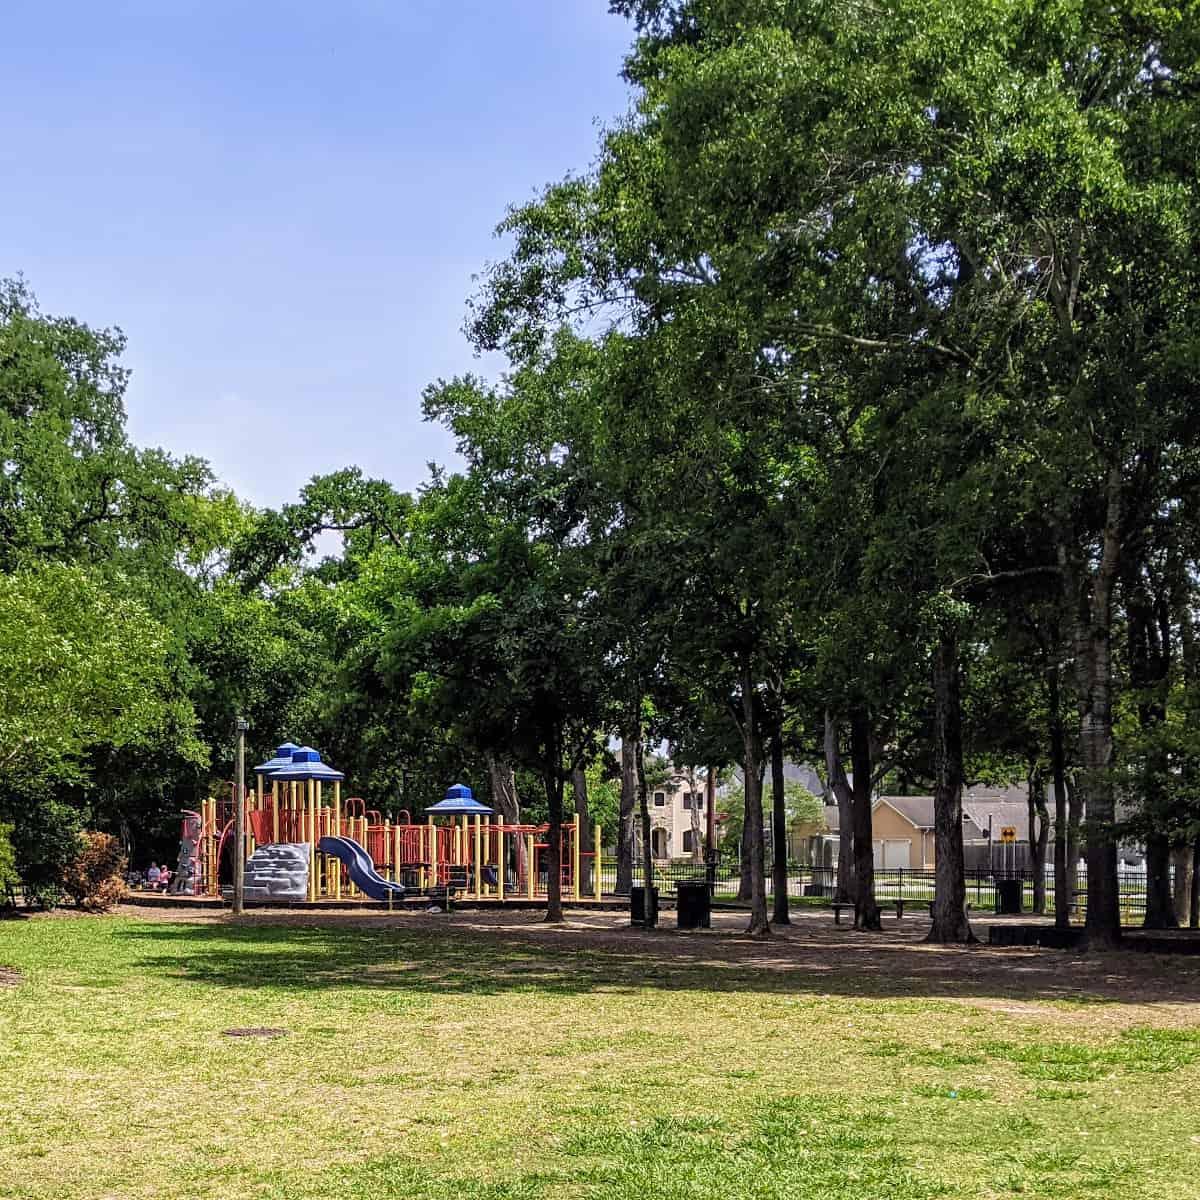 Evergreen Park Playground